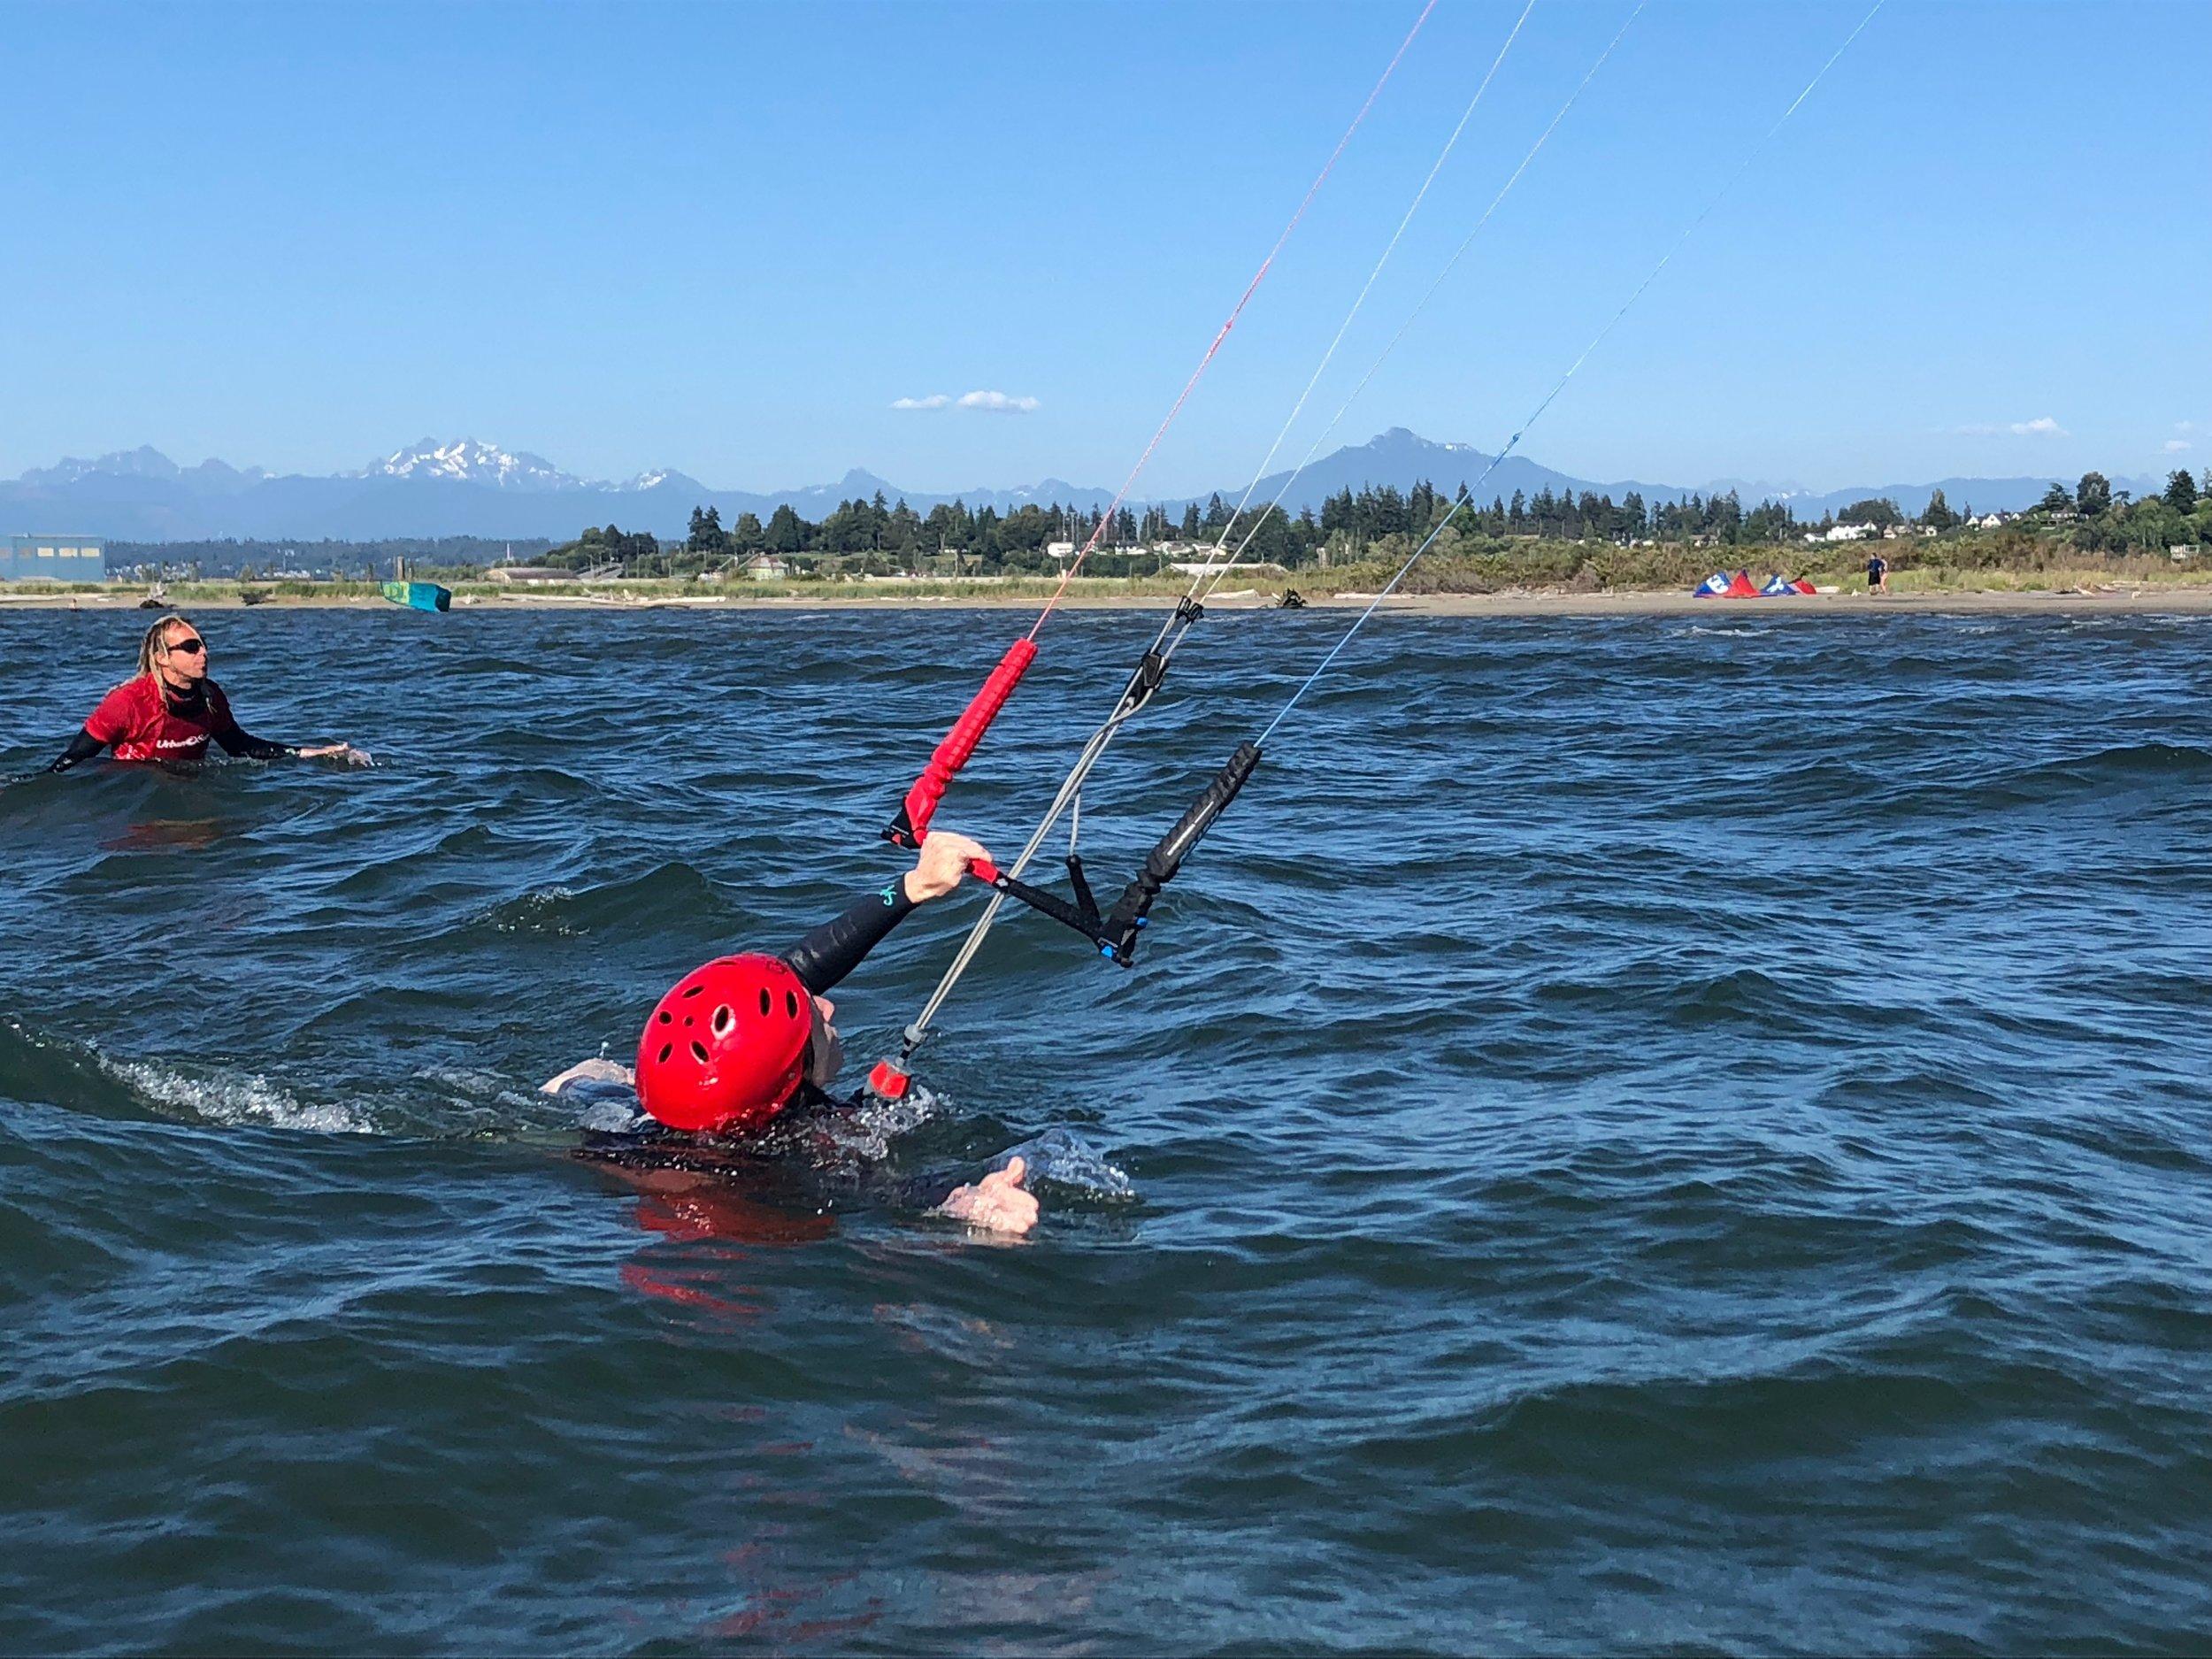 Kiteboarding Lesson with Urban Surf Kiteboarding